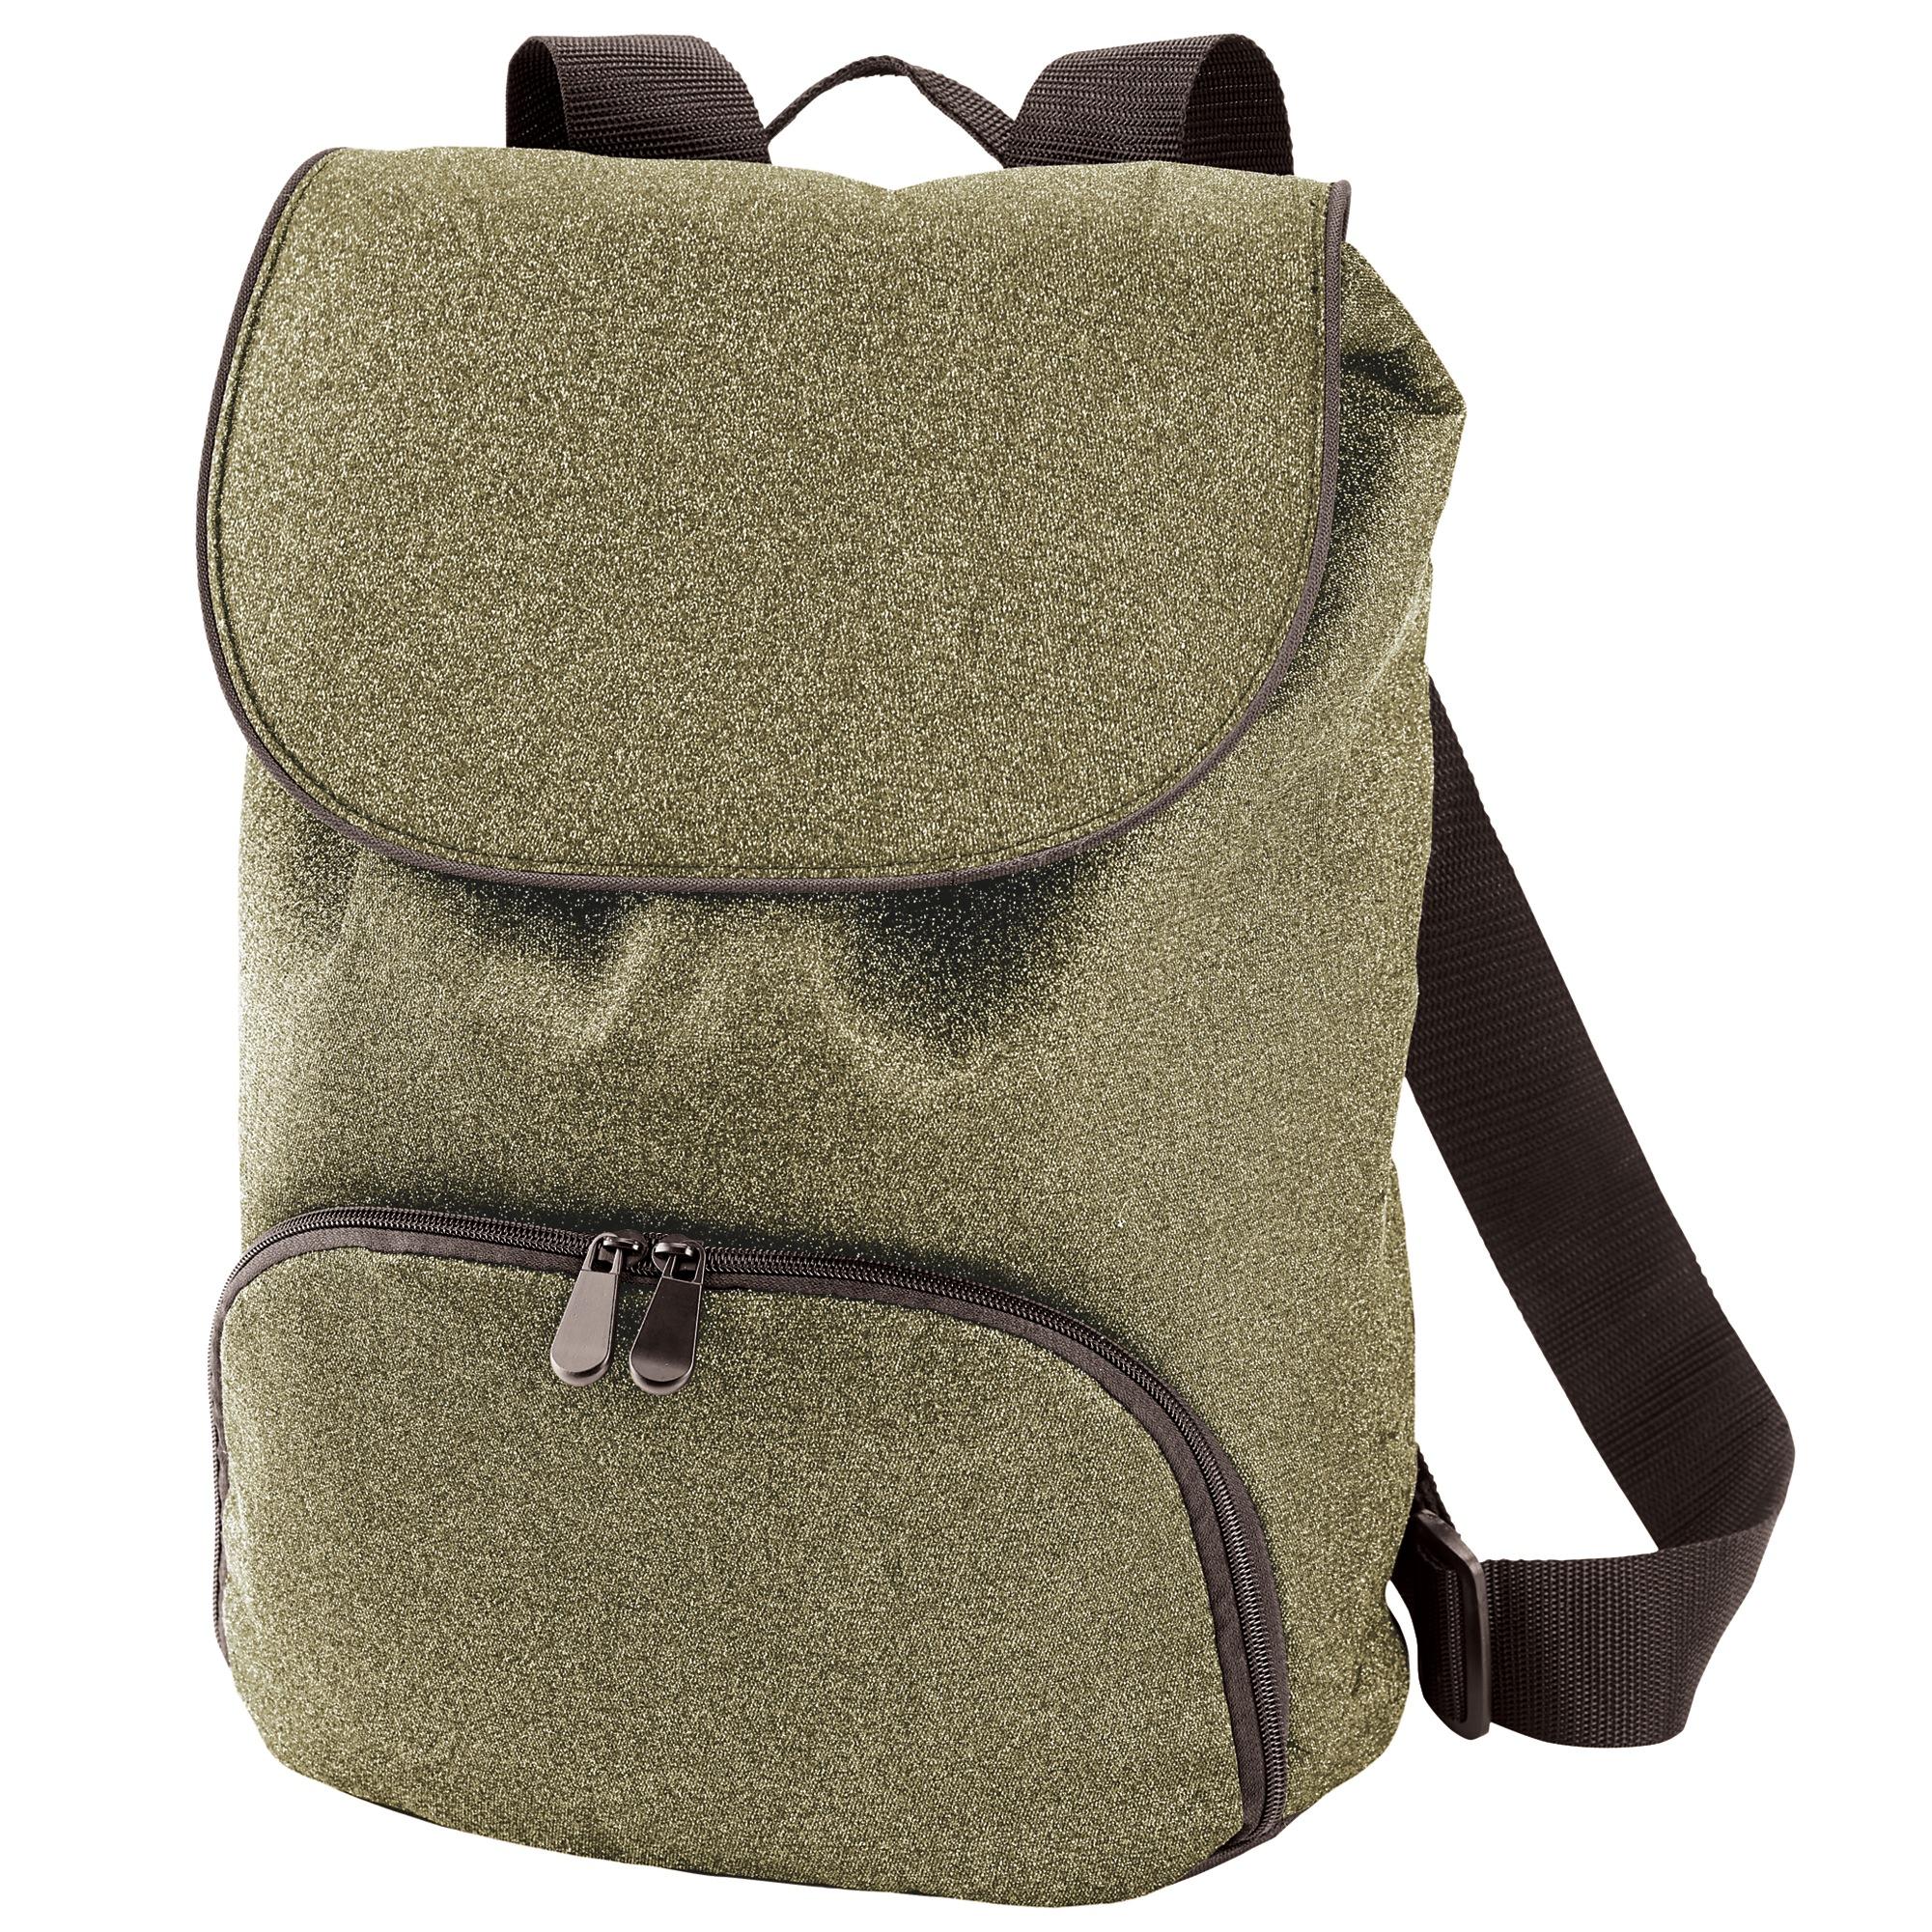 f6272d12654e Bags - Gear - Accessories